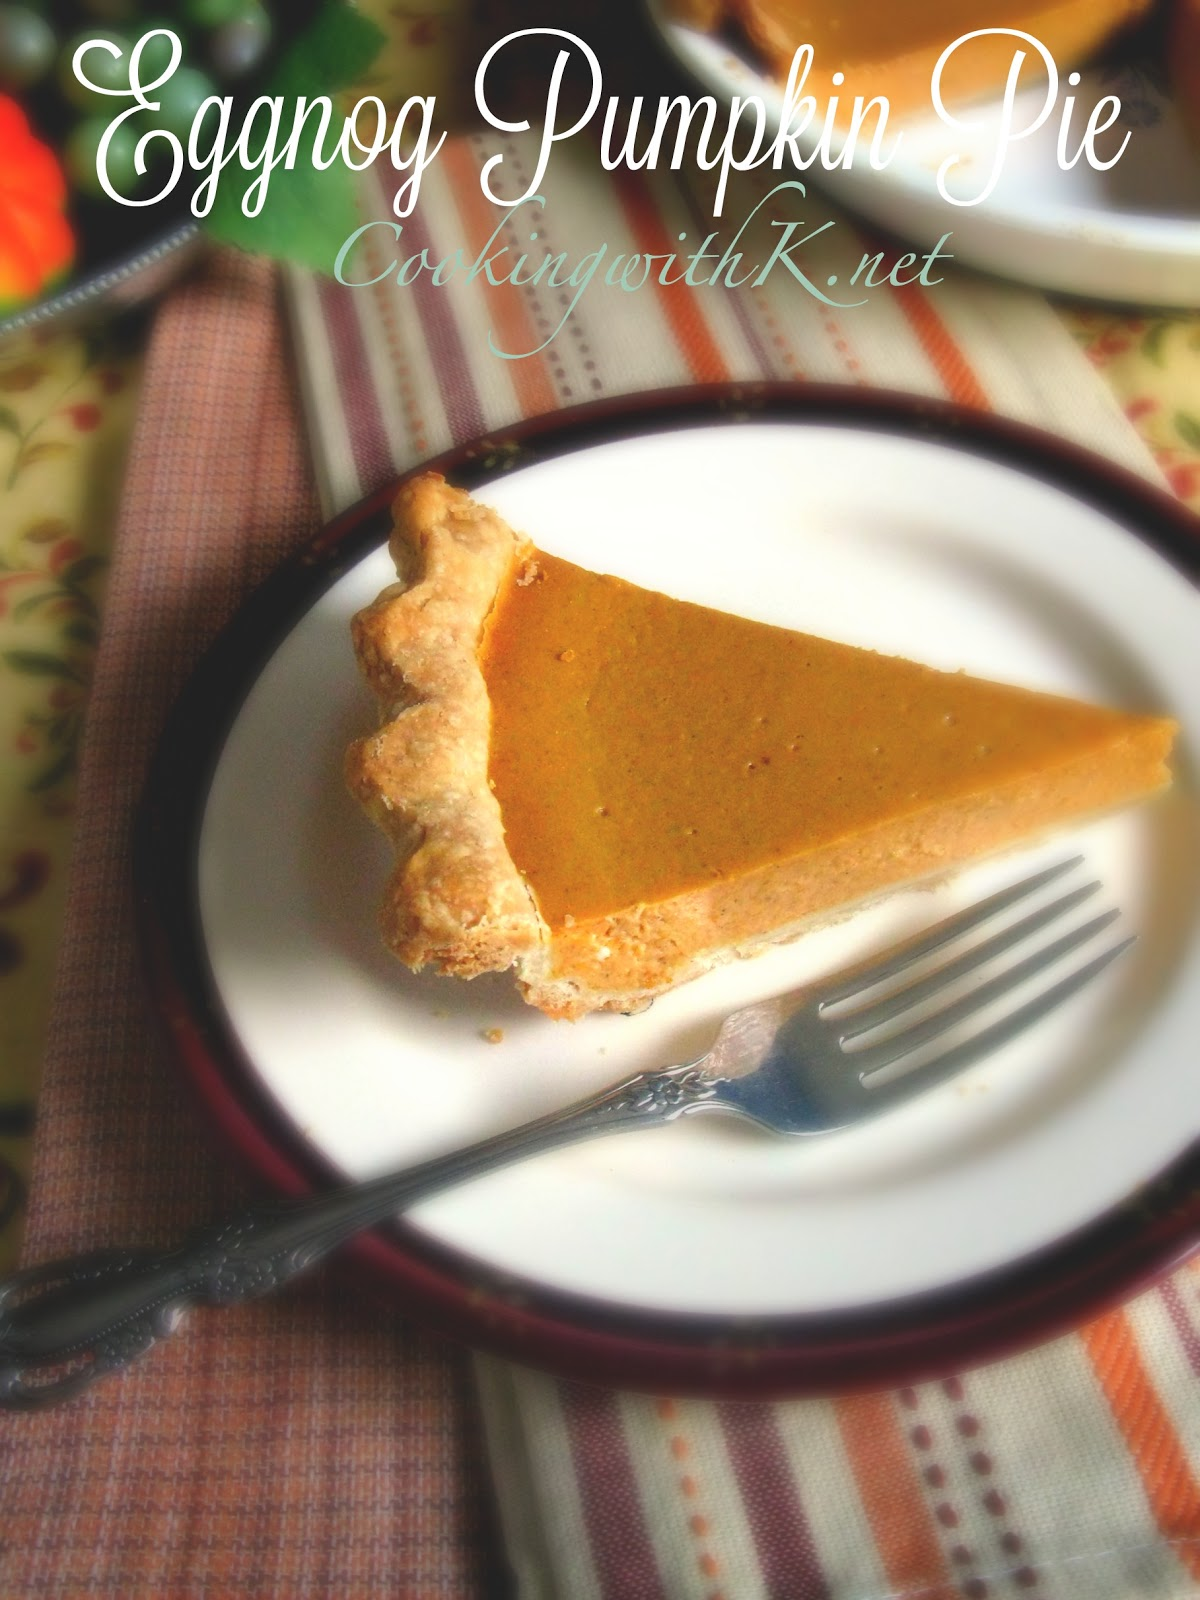 Cooking with k eggnog pumpkin pie for Pumpkin pie with a twist